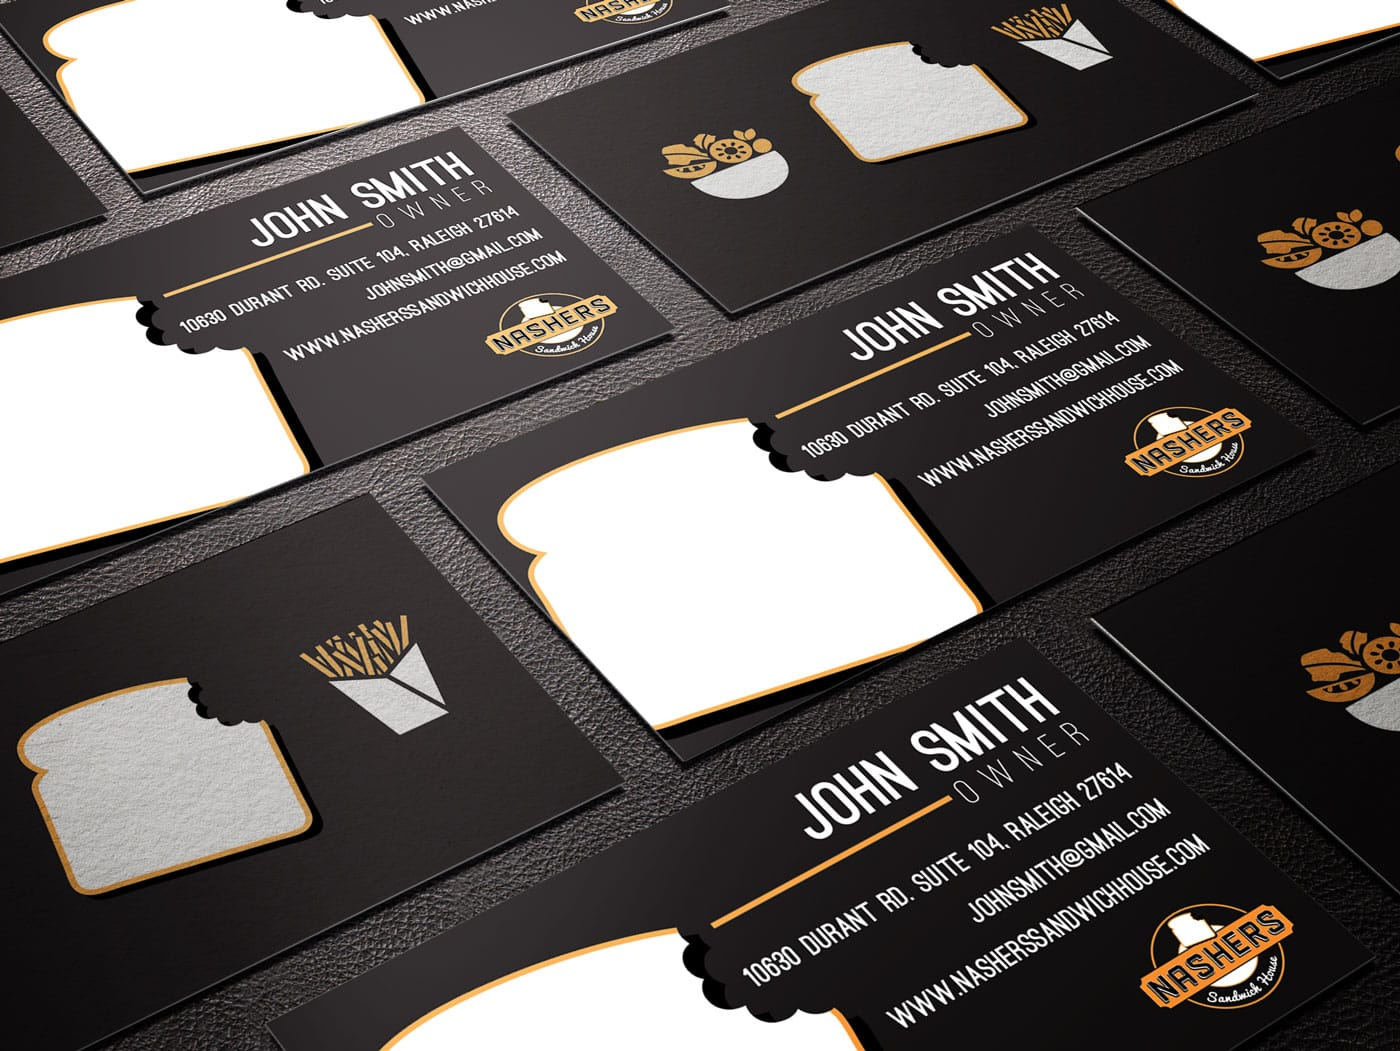 Nashers-business-card-design